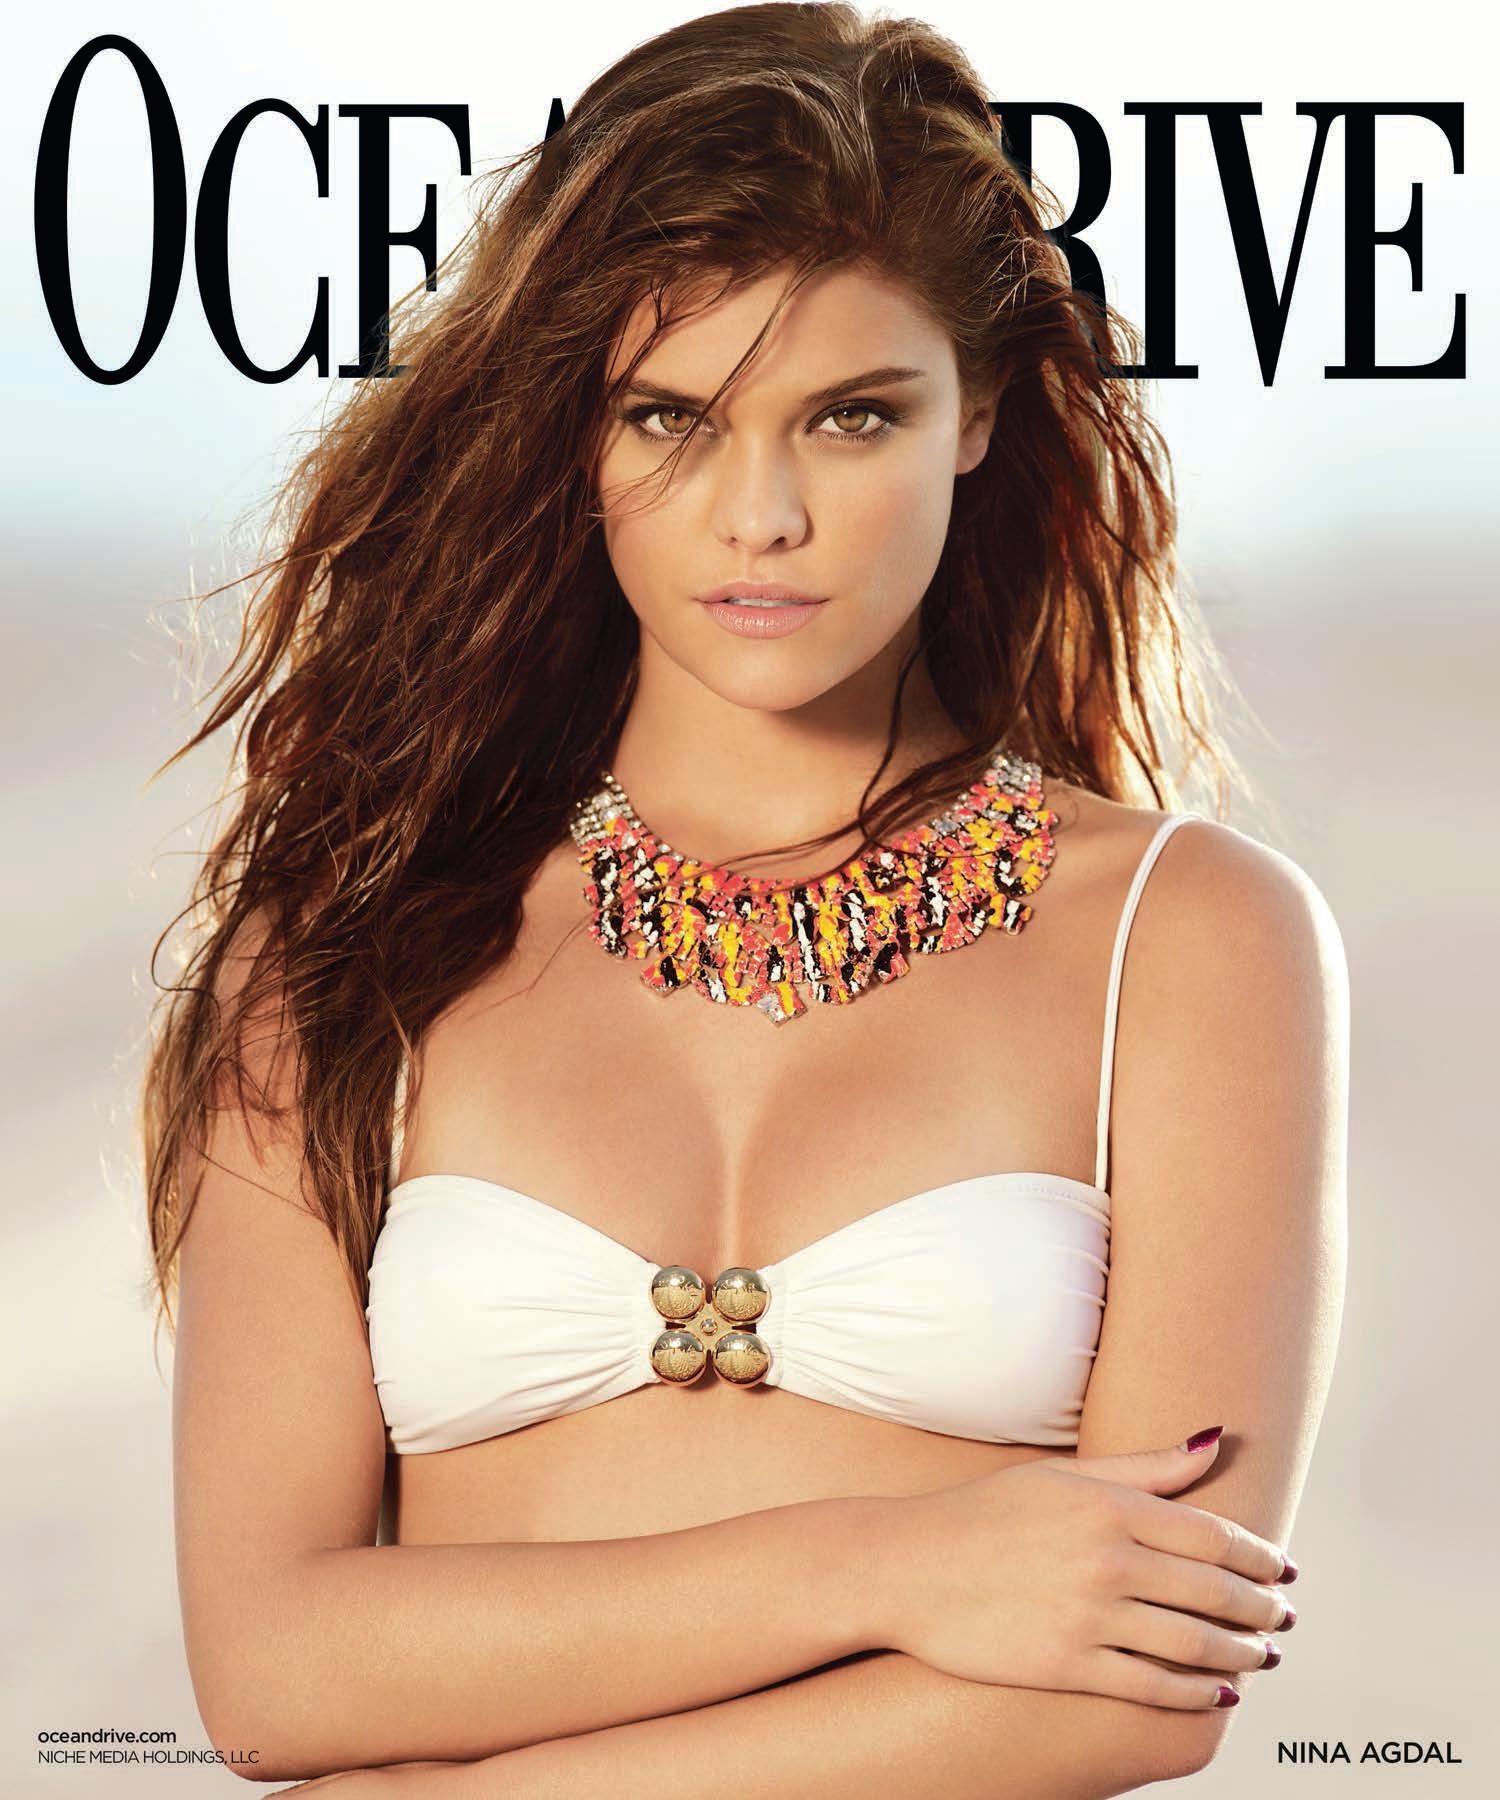 nina-agdal-ocean-drive-magazine-november-2013-01